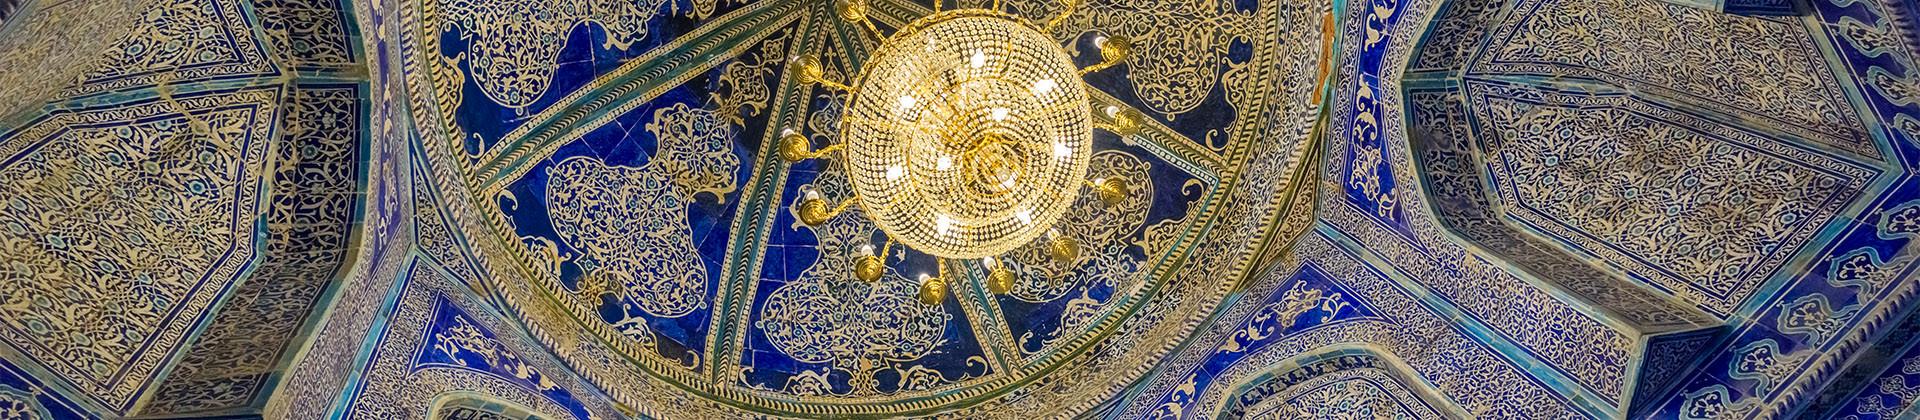 Wonderful Uzbekistan (Comfort) - 1